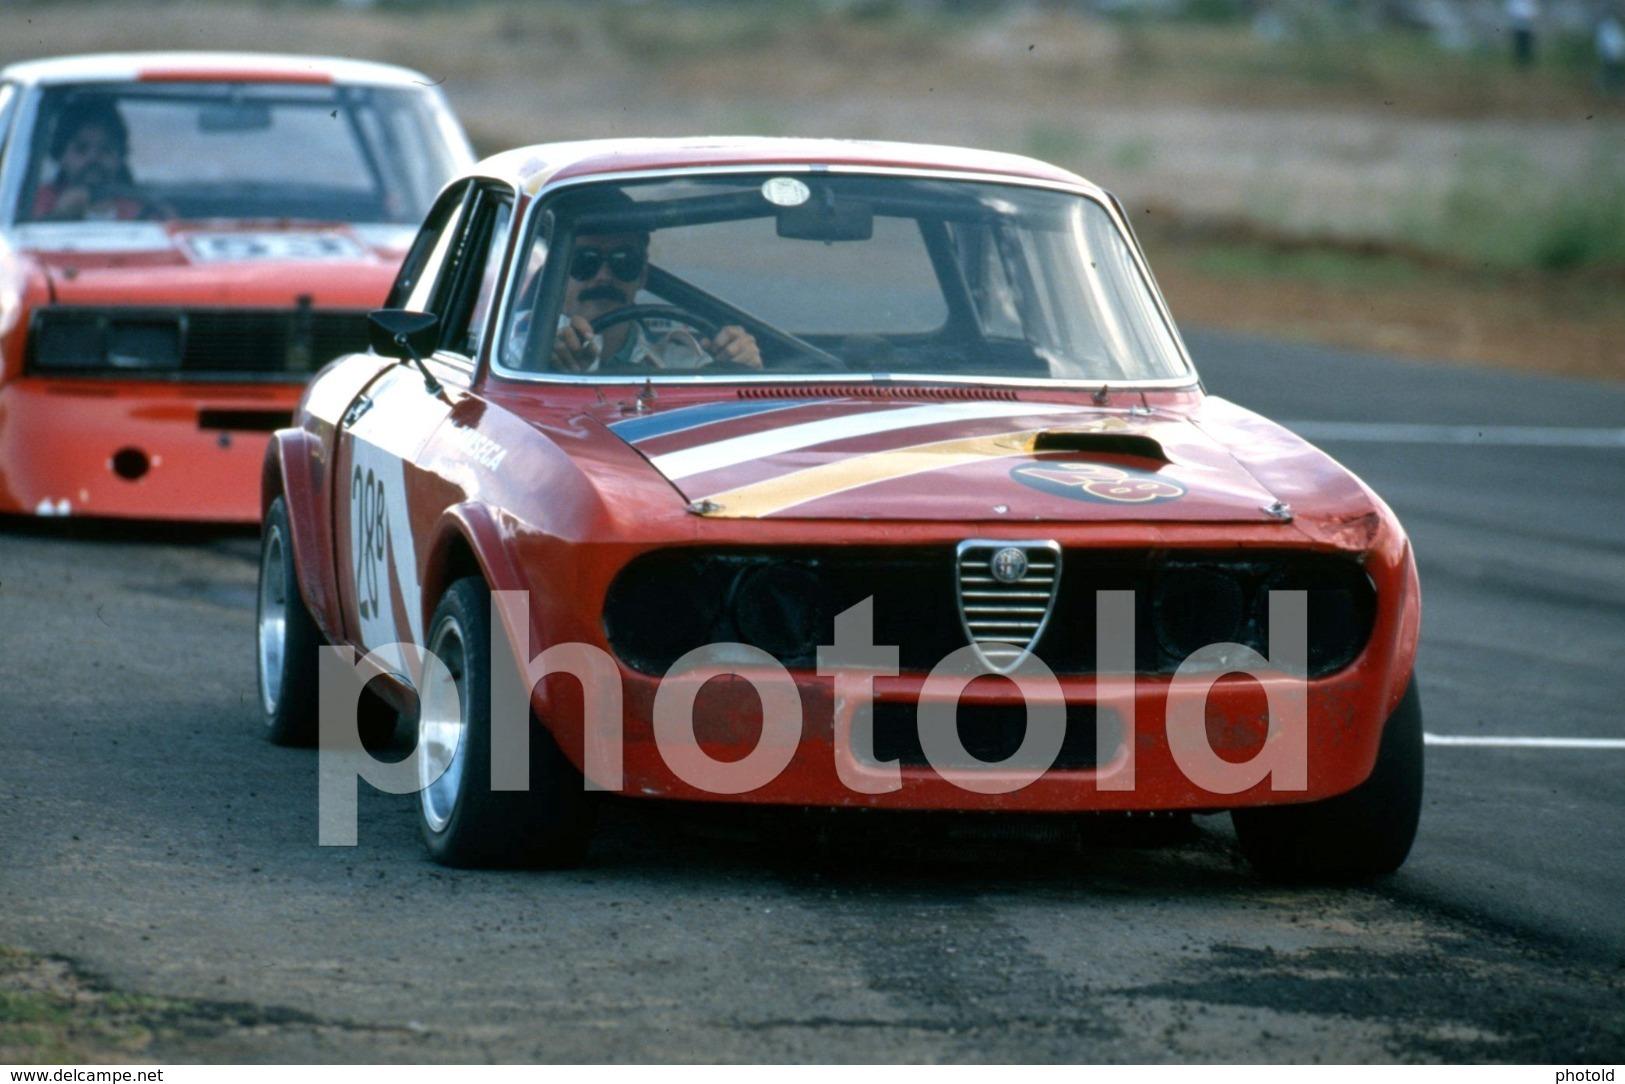 1997 ALFA ROMEO GTV CAR RACING AUTODROMO MOÇAMBIQUE AFRICA AFRIQUE 35mm PRESS DIAPOSITIVE SLIDE Not PHOTO No FOTO B4925 - Dias